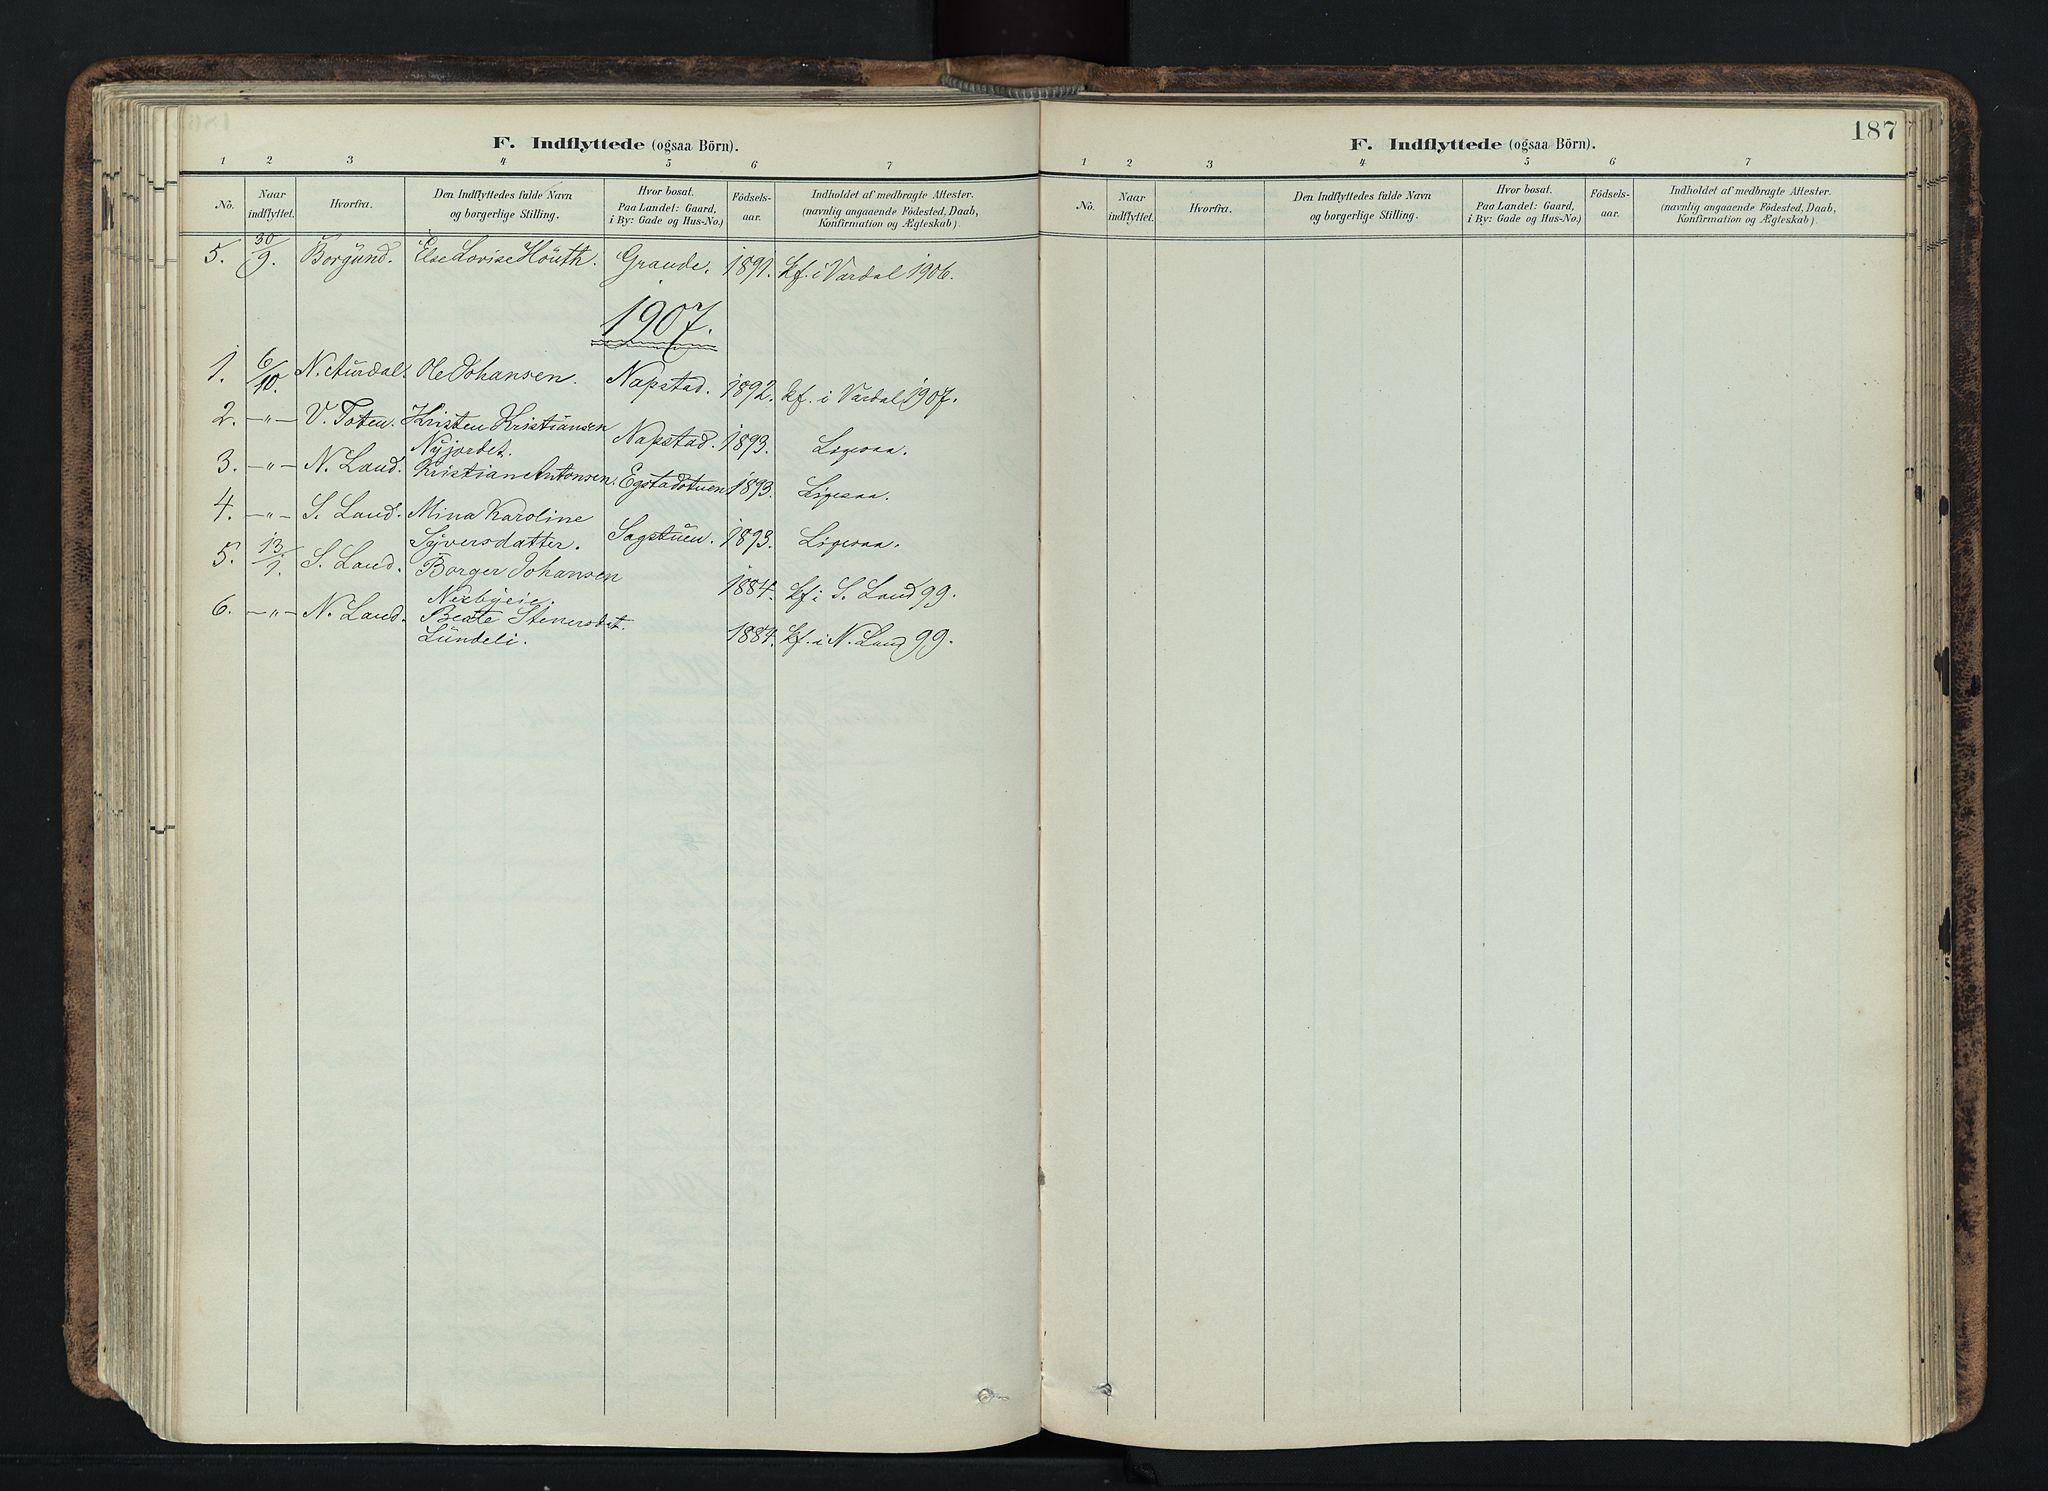 SAH, Vardal prestekontor, H/Ha/Haa/L0019: Ministerialbok nr. 19, 1893-1907, s. 187